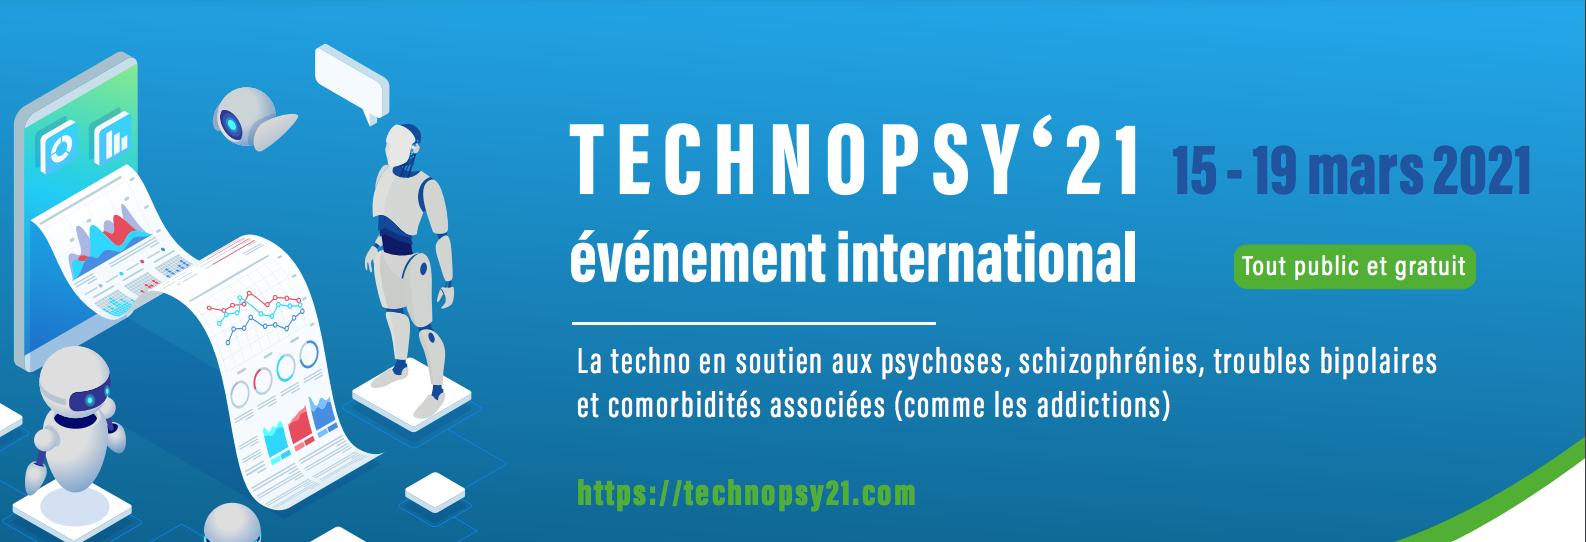 Technopsy'21 Technopsy